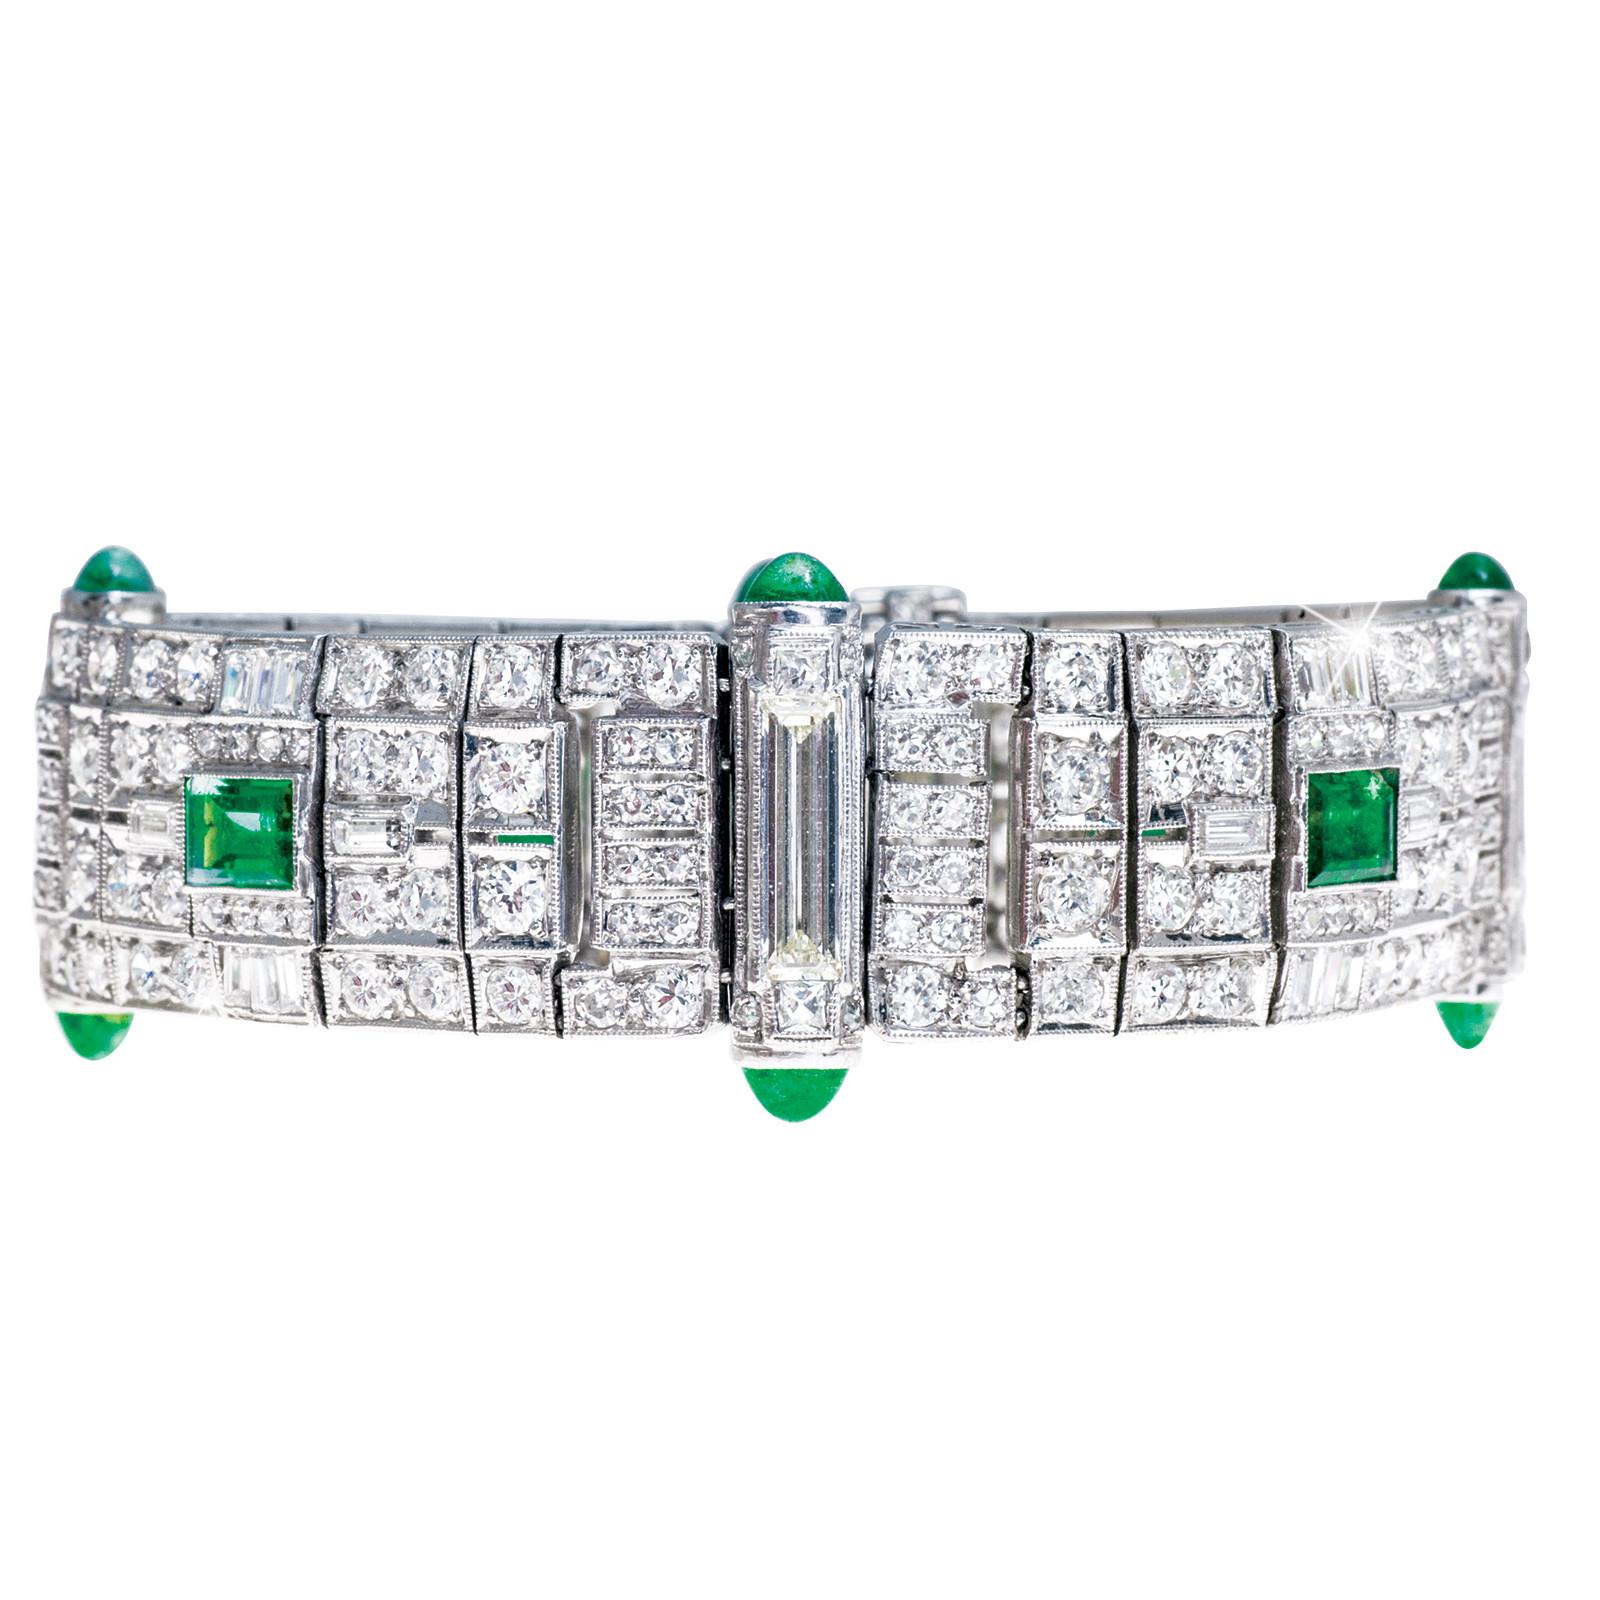 Vintage 13.74 CTW Diamond & Emerald Bracelet